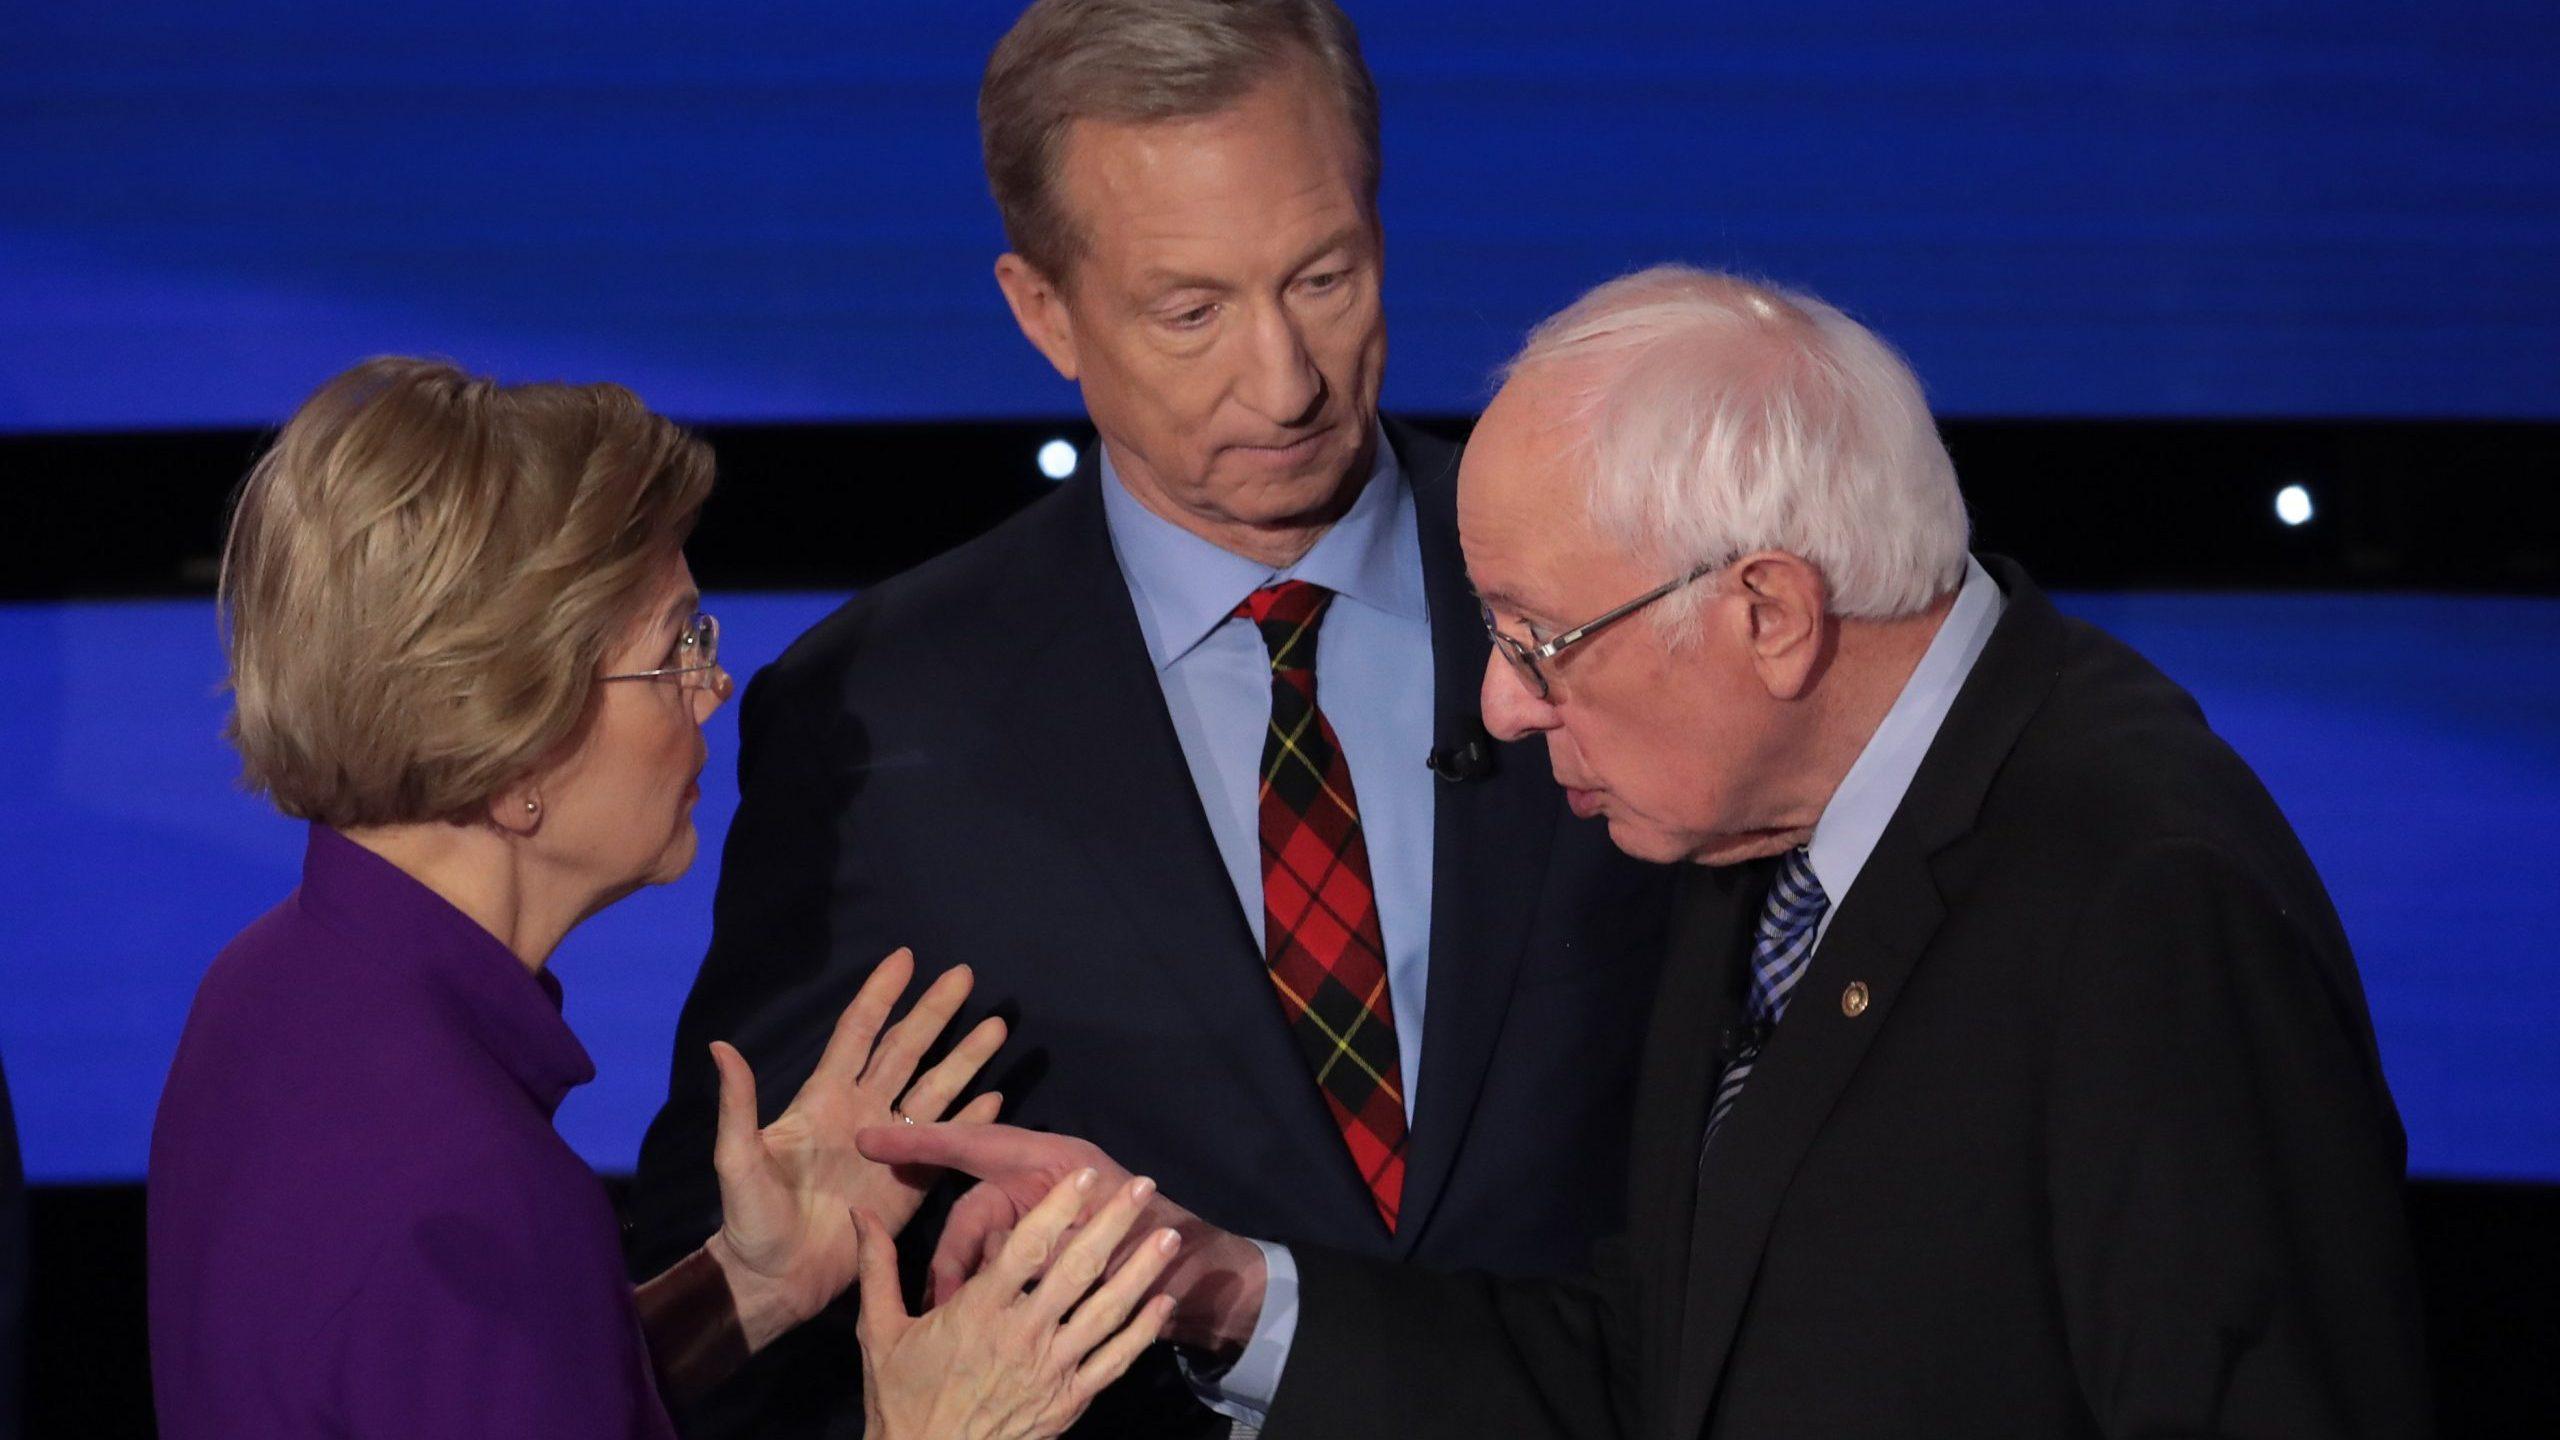 Sen. Elizabeth Warren (D-MA) and Sen. Bernie Sanders (I-VT) speak as Tom Steyer looks on after the Democratic presidential primary debate on Jan. 14, 2020 in Des Moines, Iowa. (Credit: Scott Olson/Getty Images)